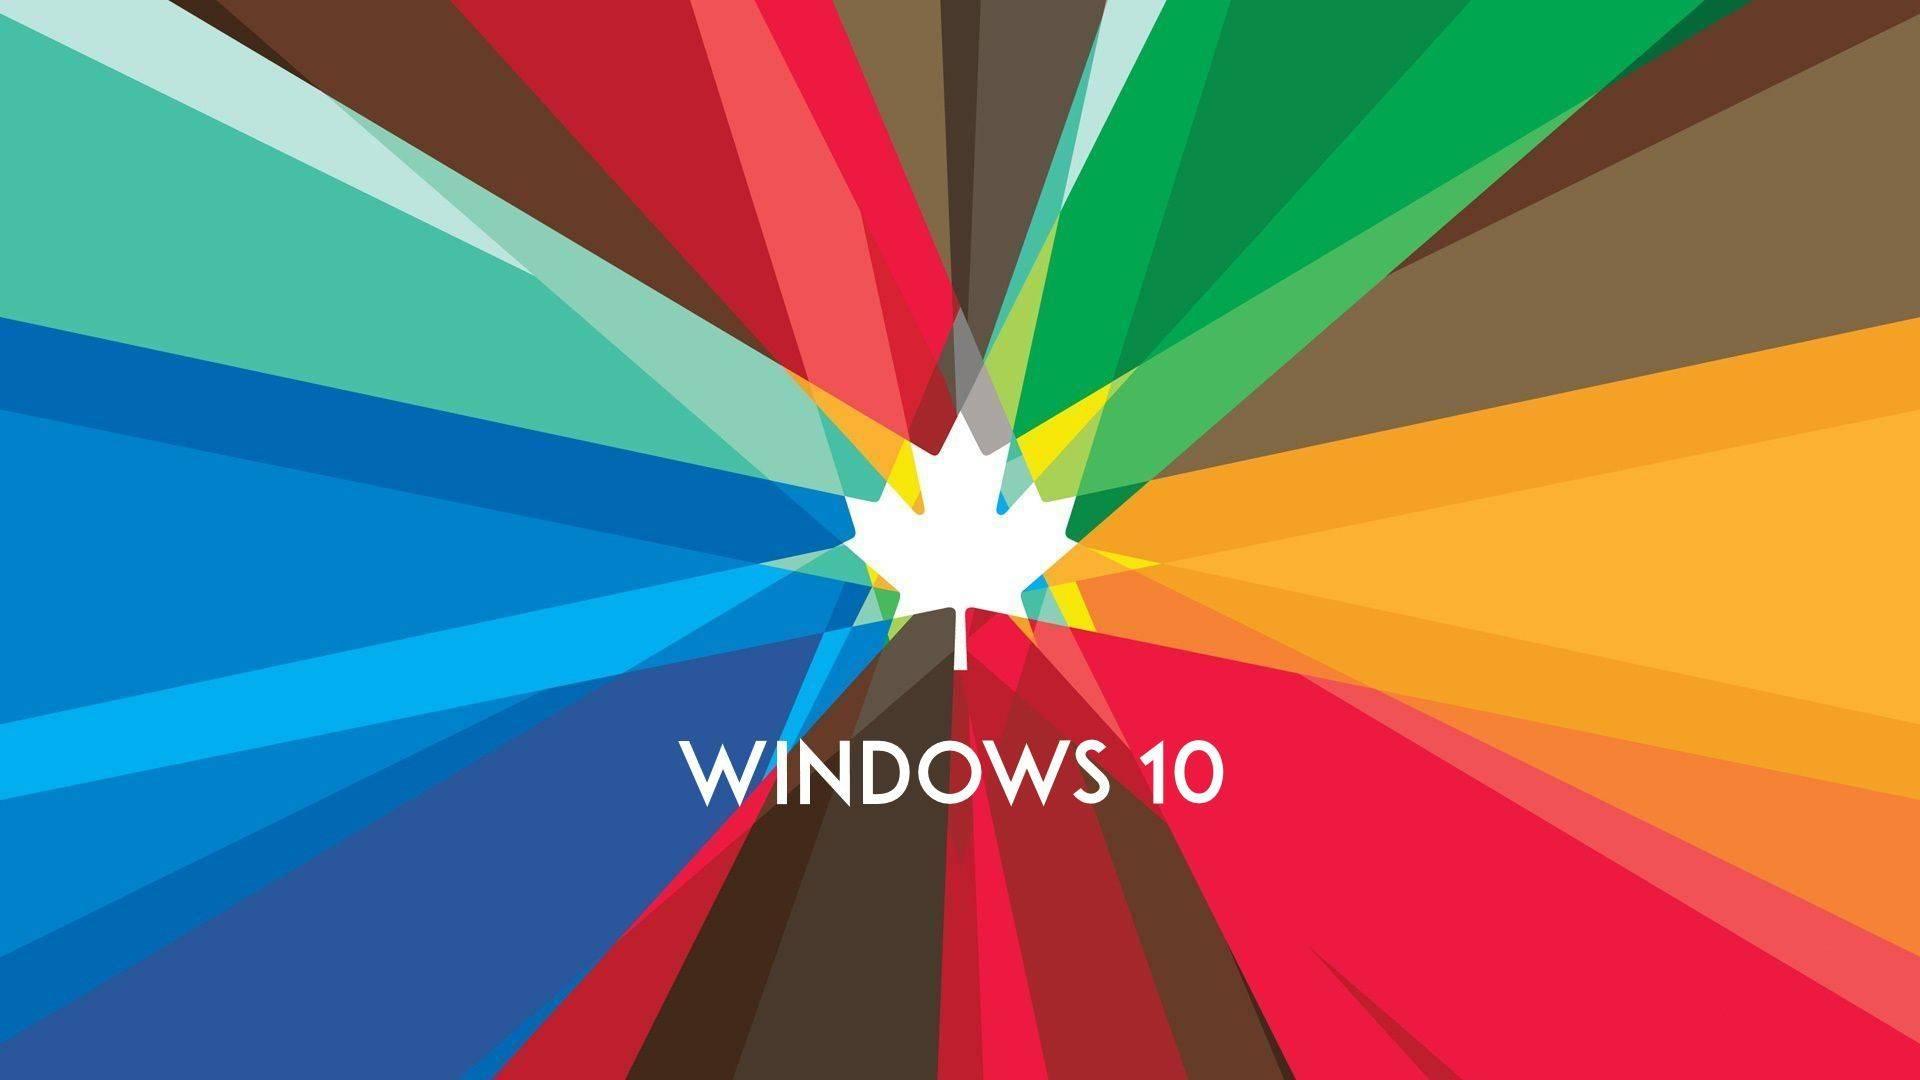 Windows-10-HD-Wallpaper-30